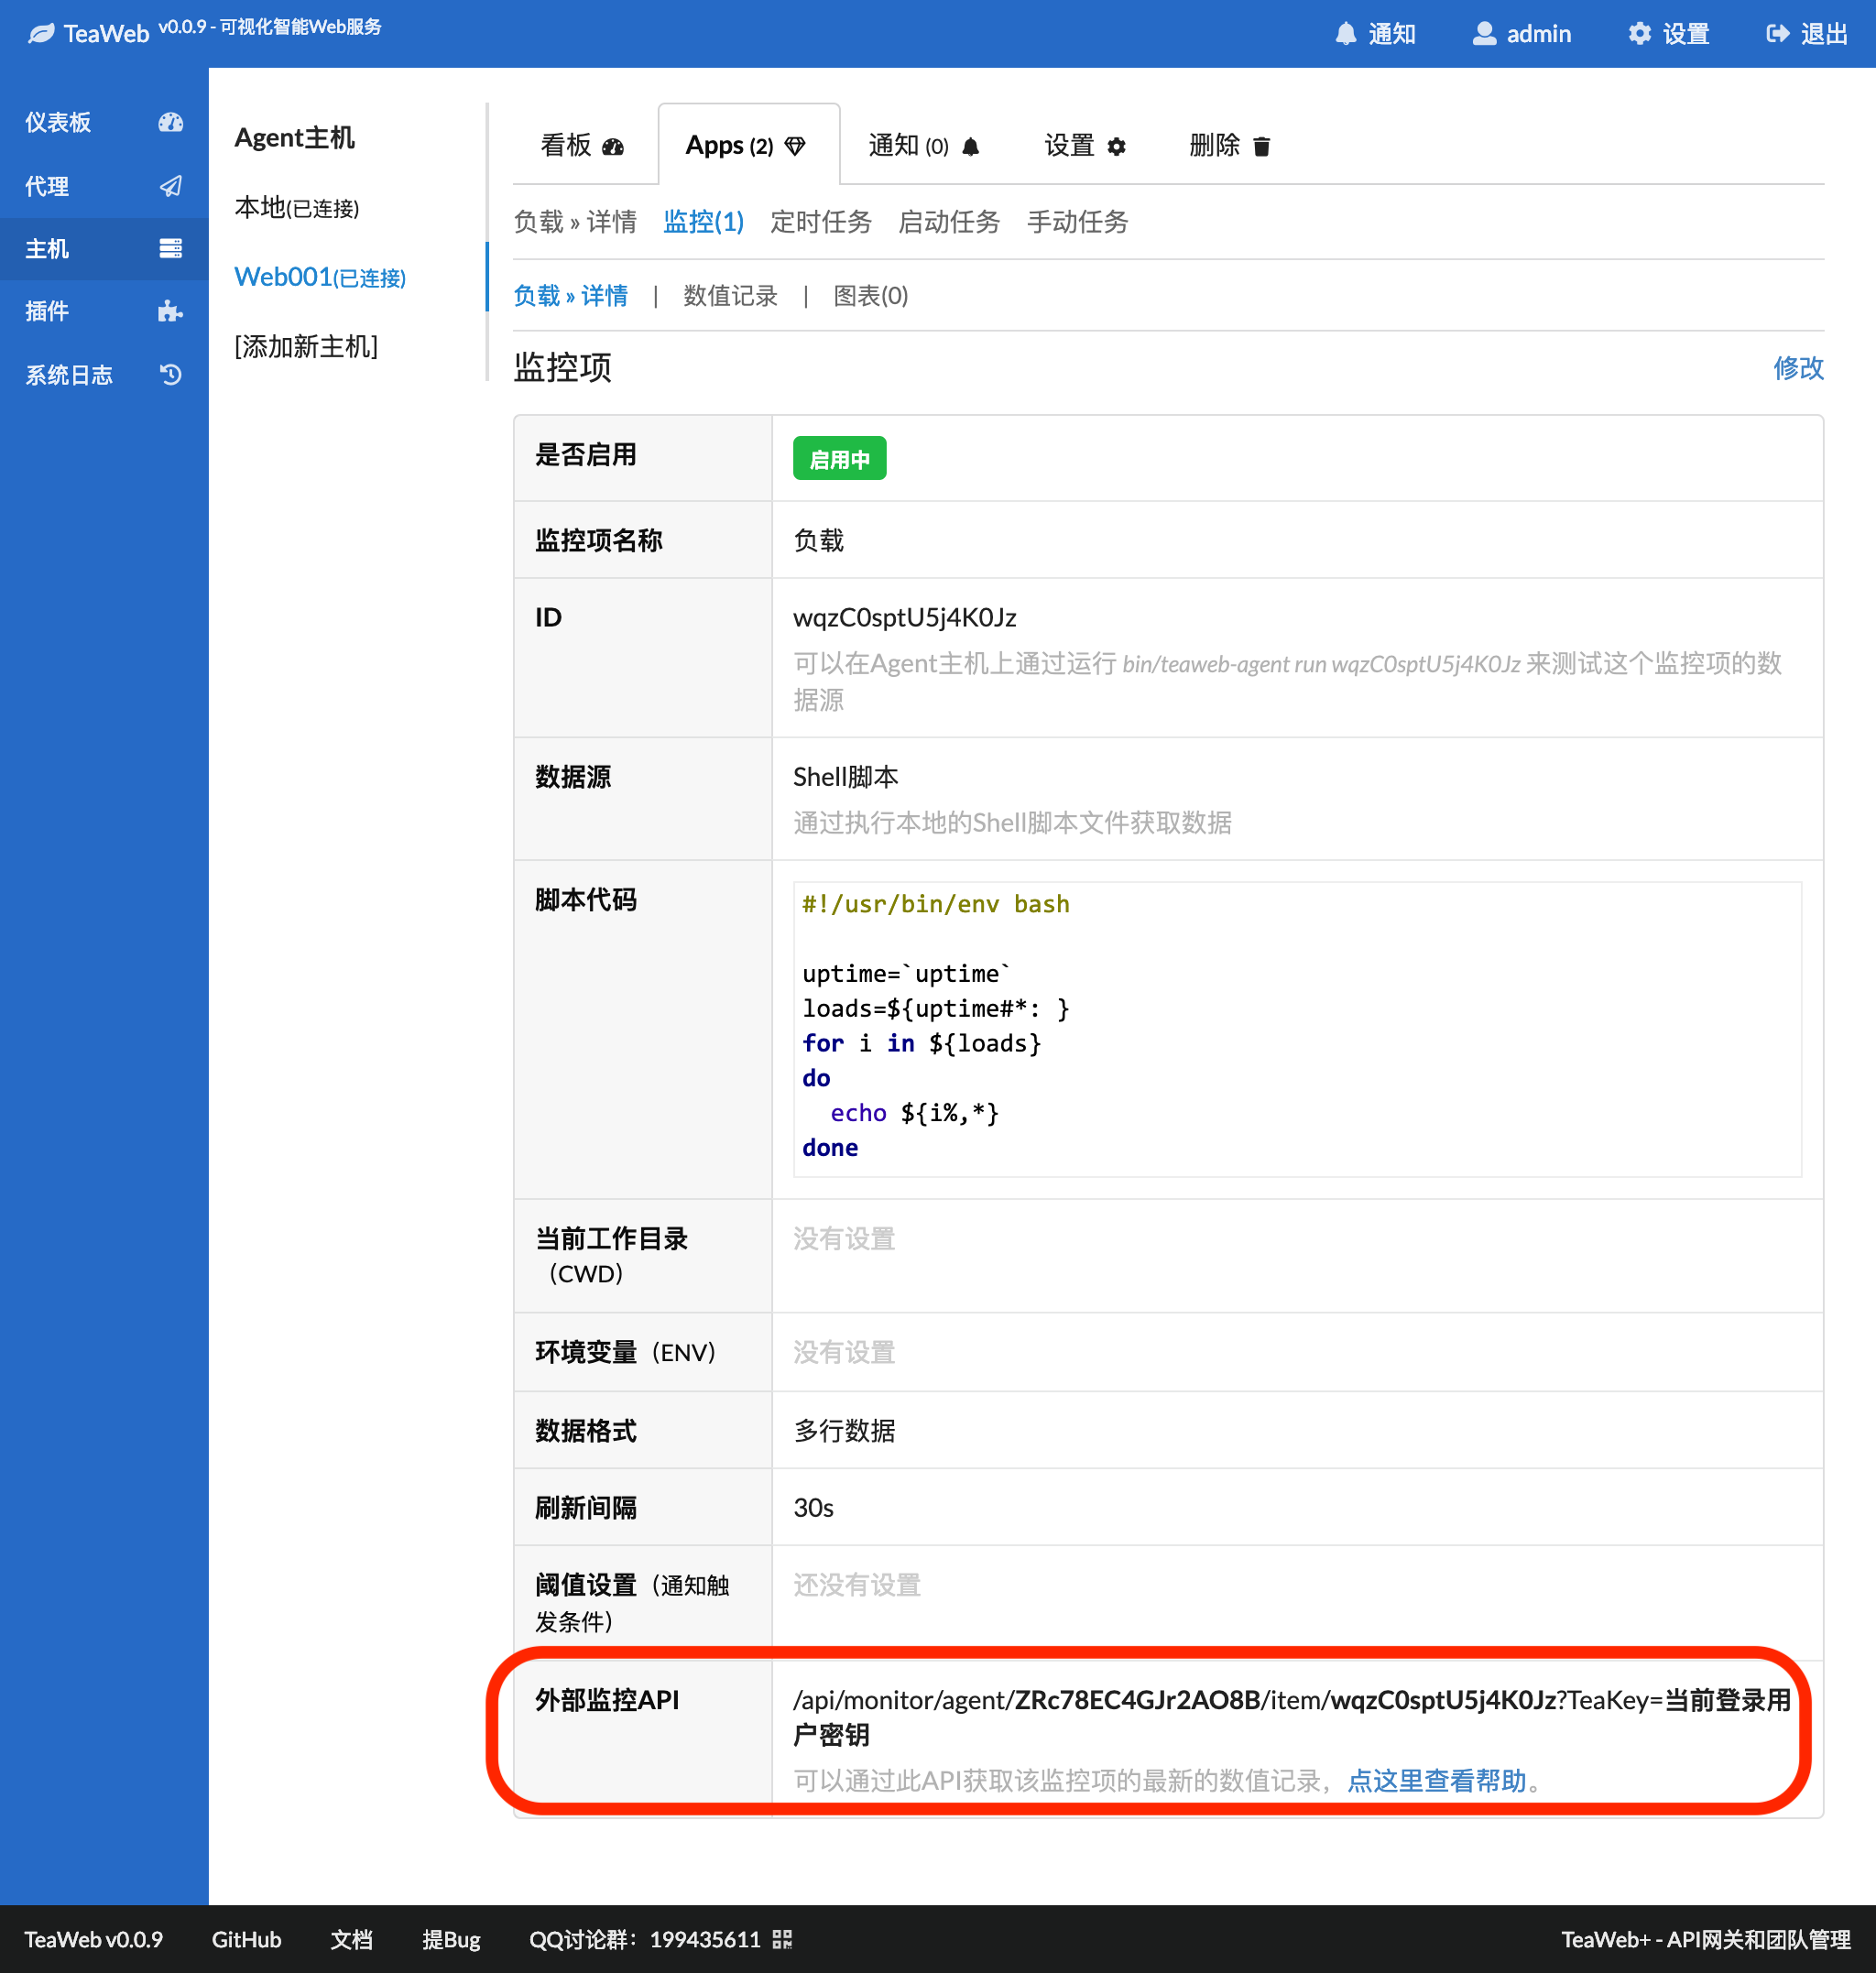 api_monitor_agent_item.png